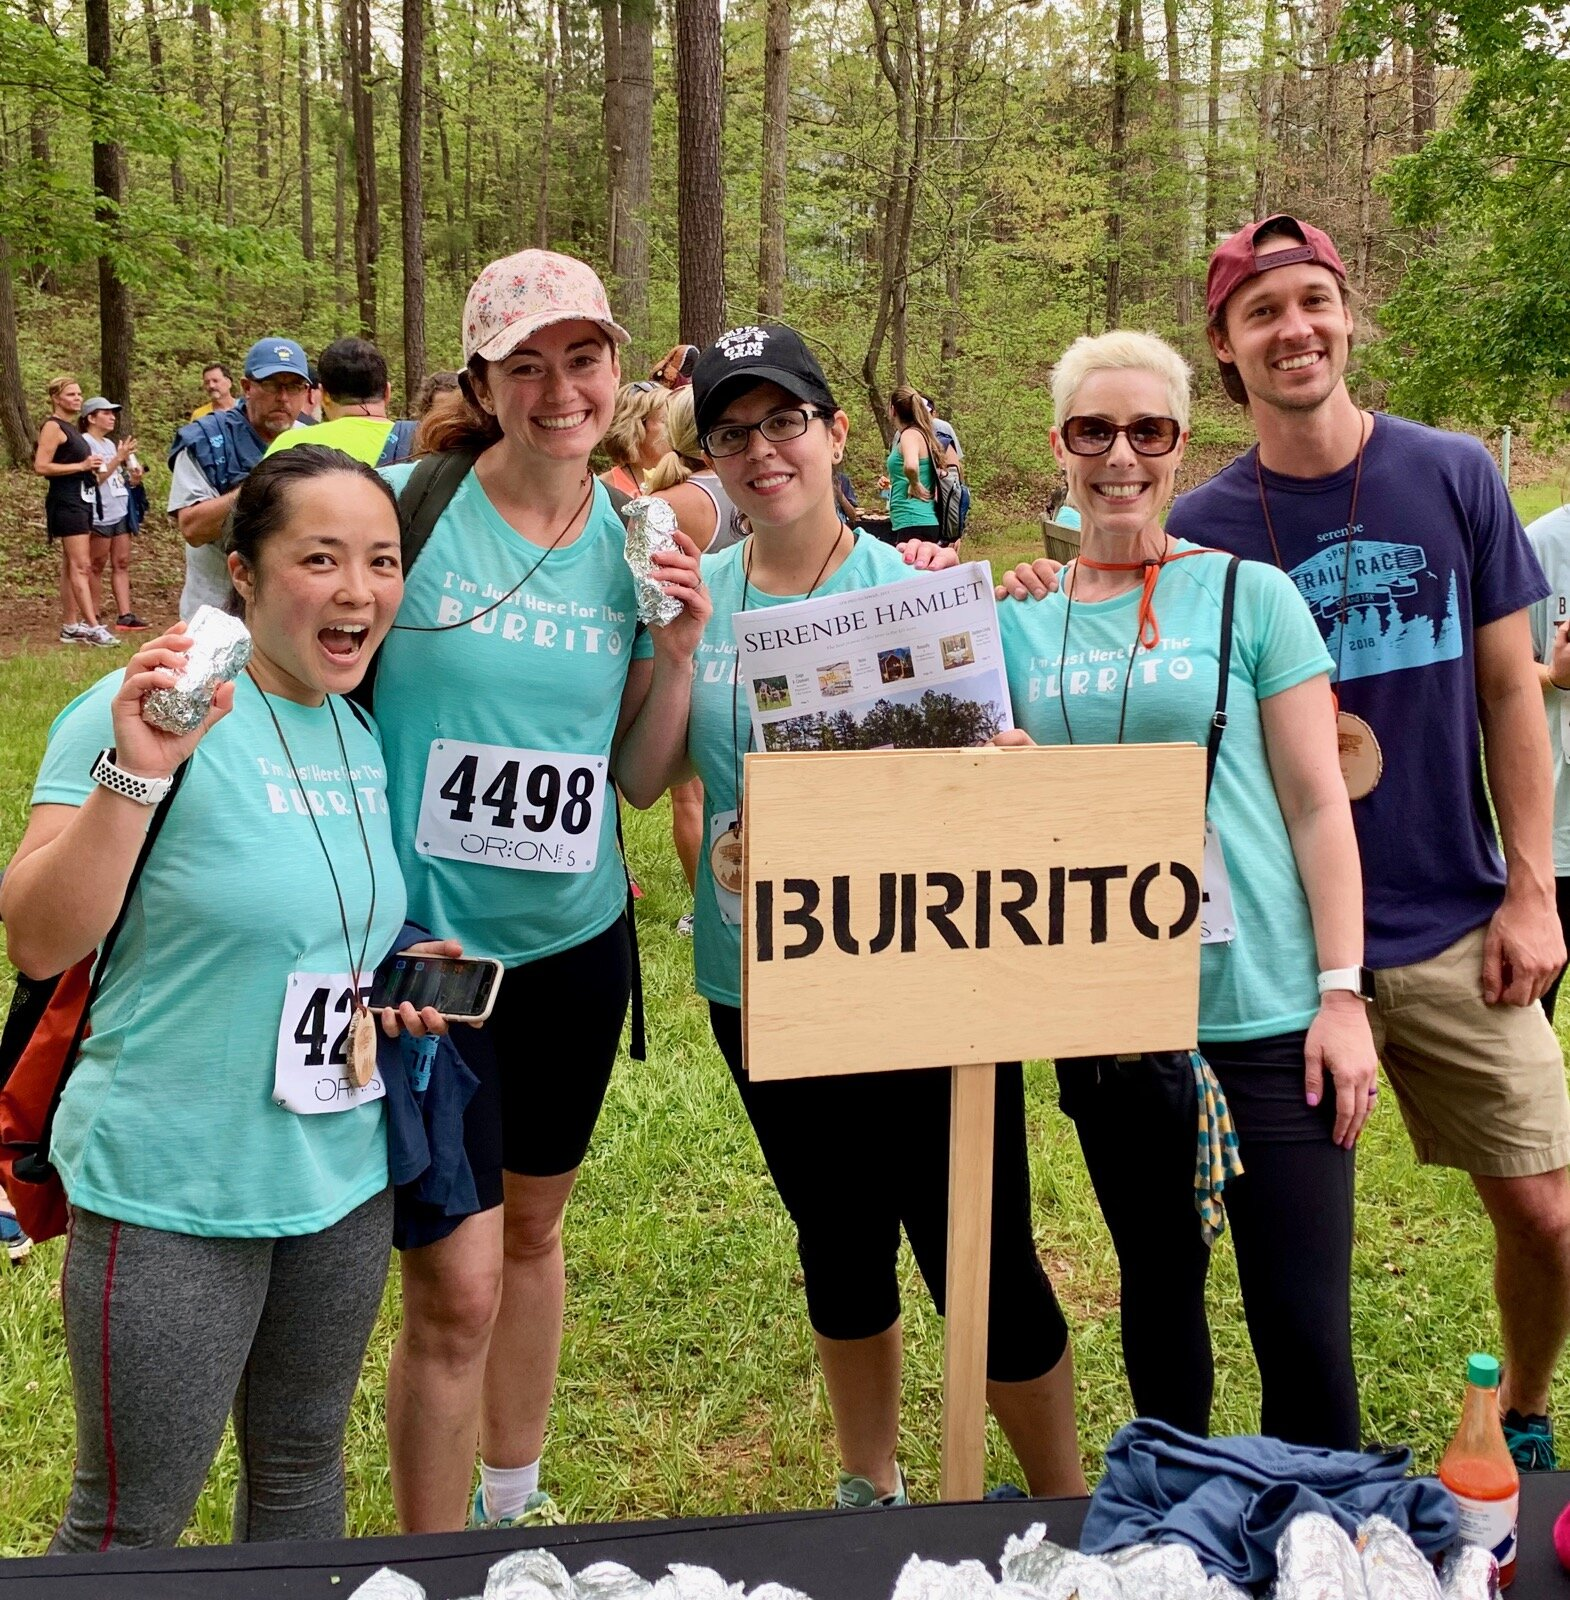 TR.Spring19.BurritoFriends2.jpg